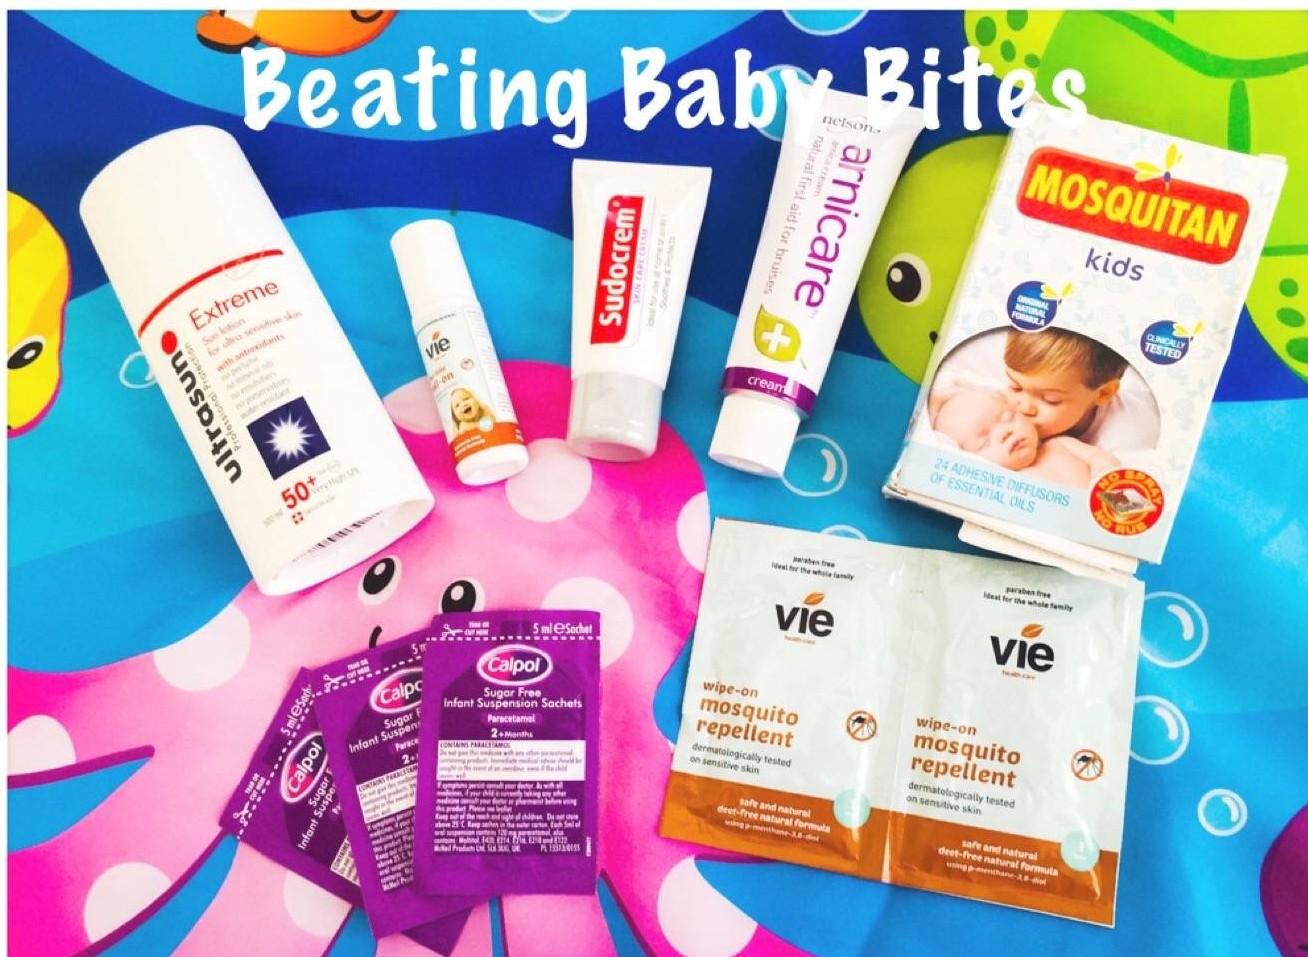 Beating Baby Bites